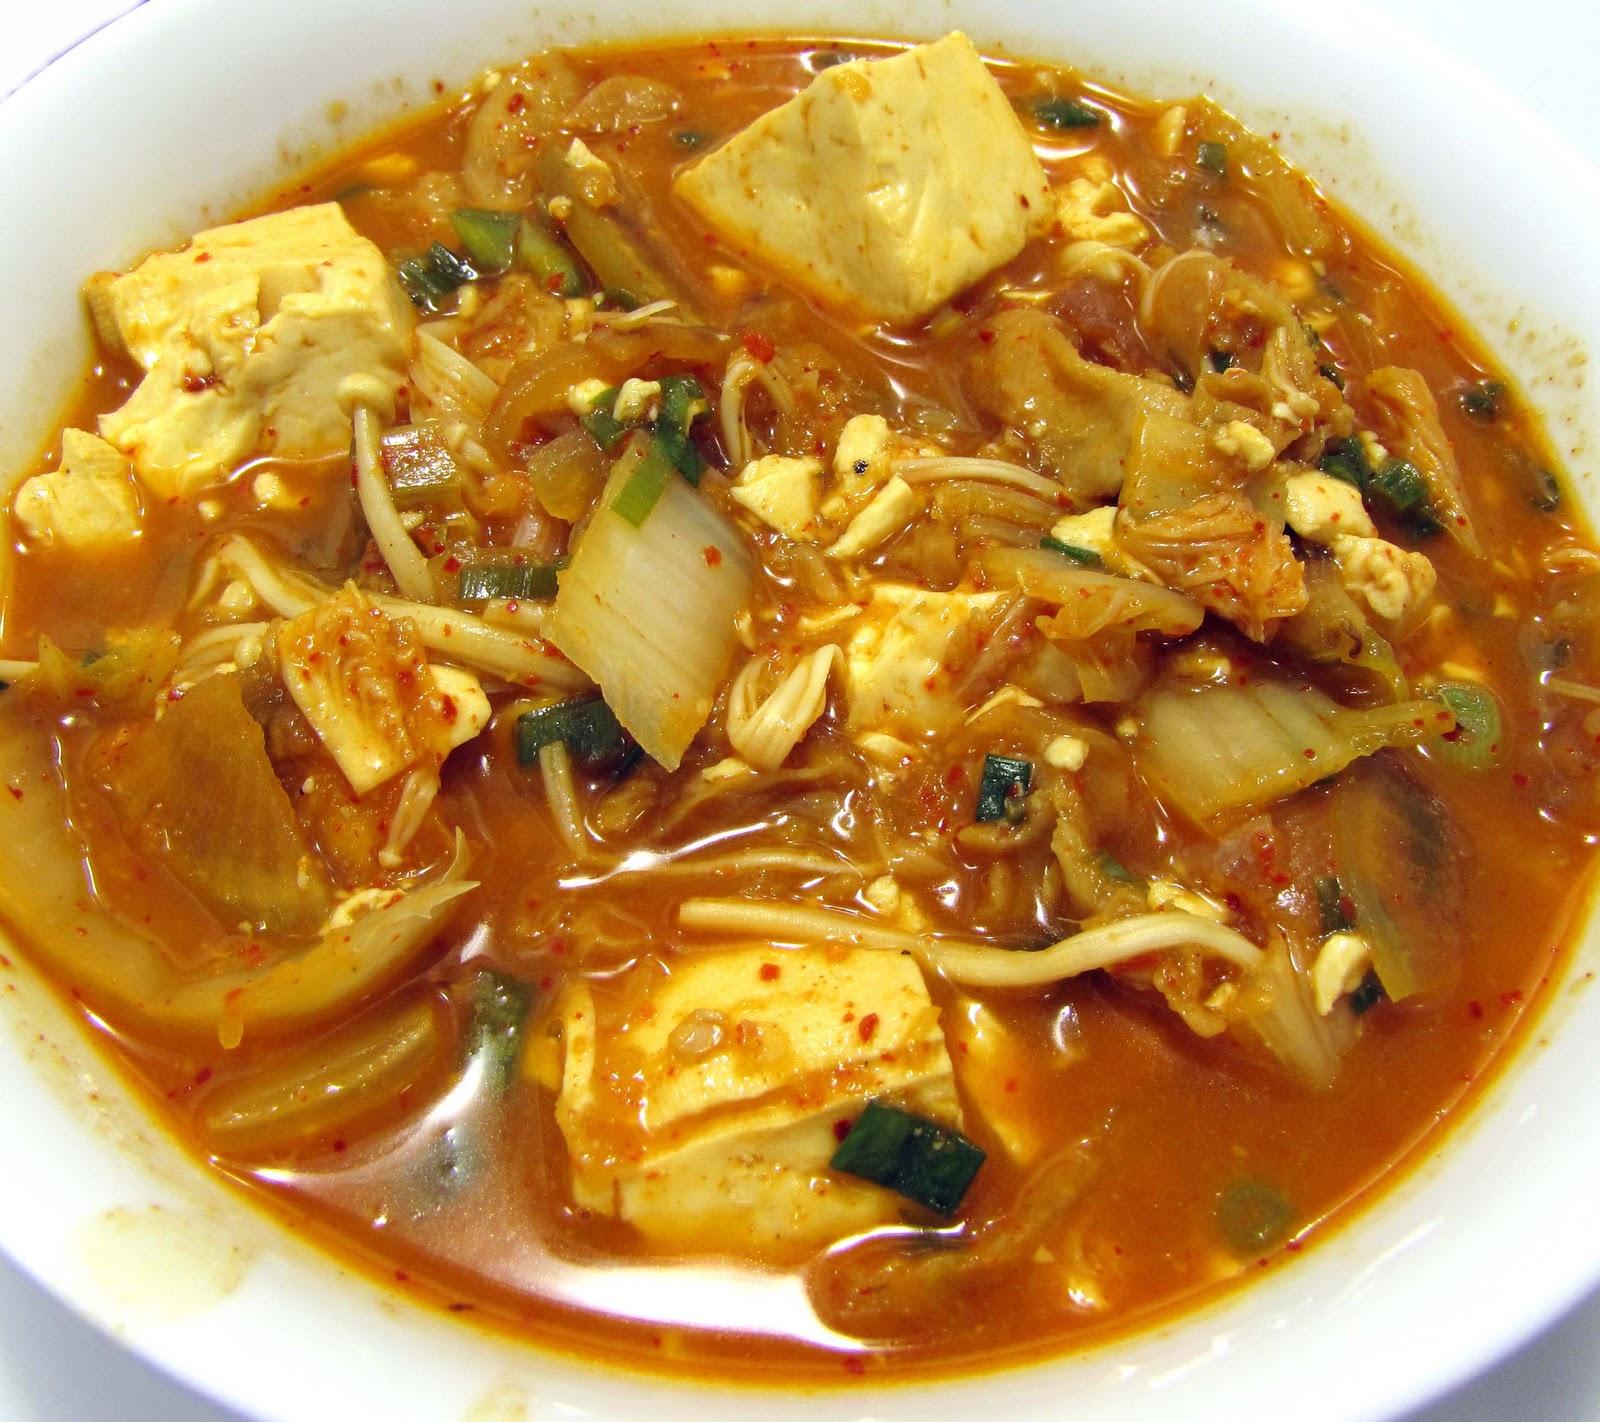 The Airy Way: More fun with kimchi - Kimchi jigae (kimchi soup)